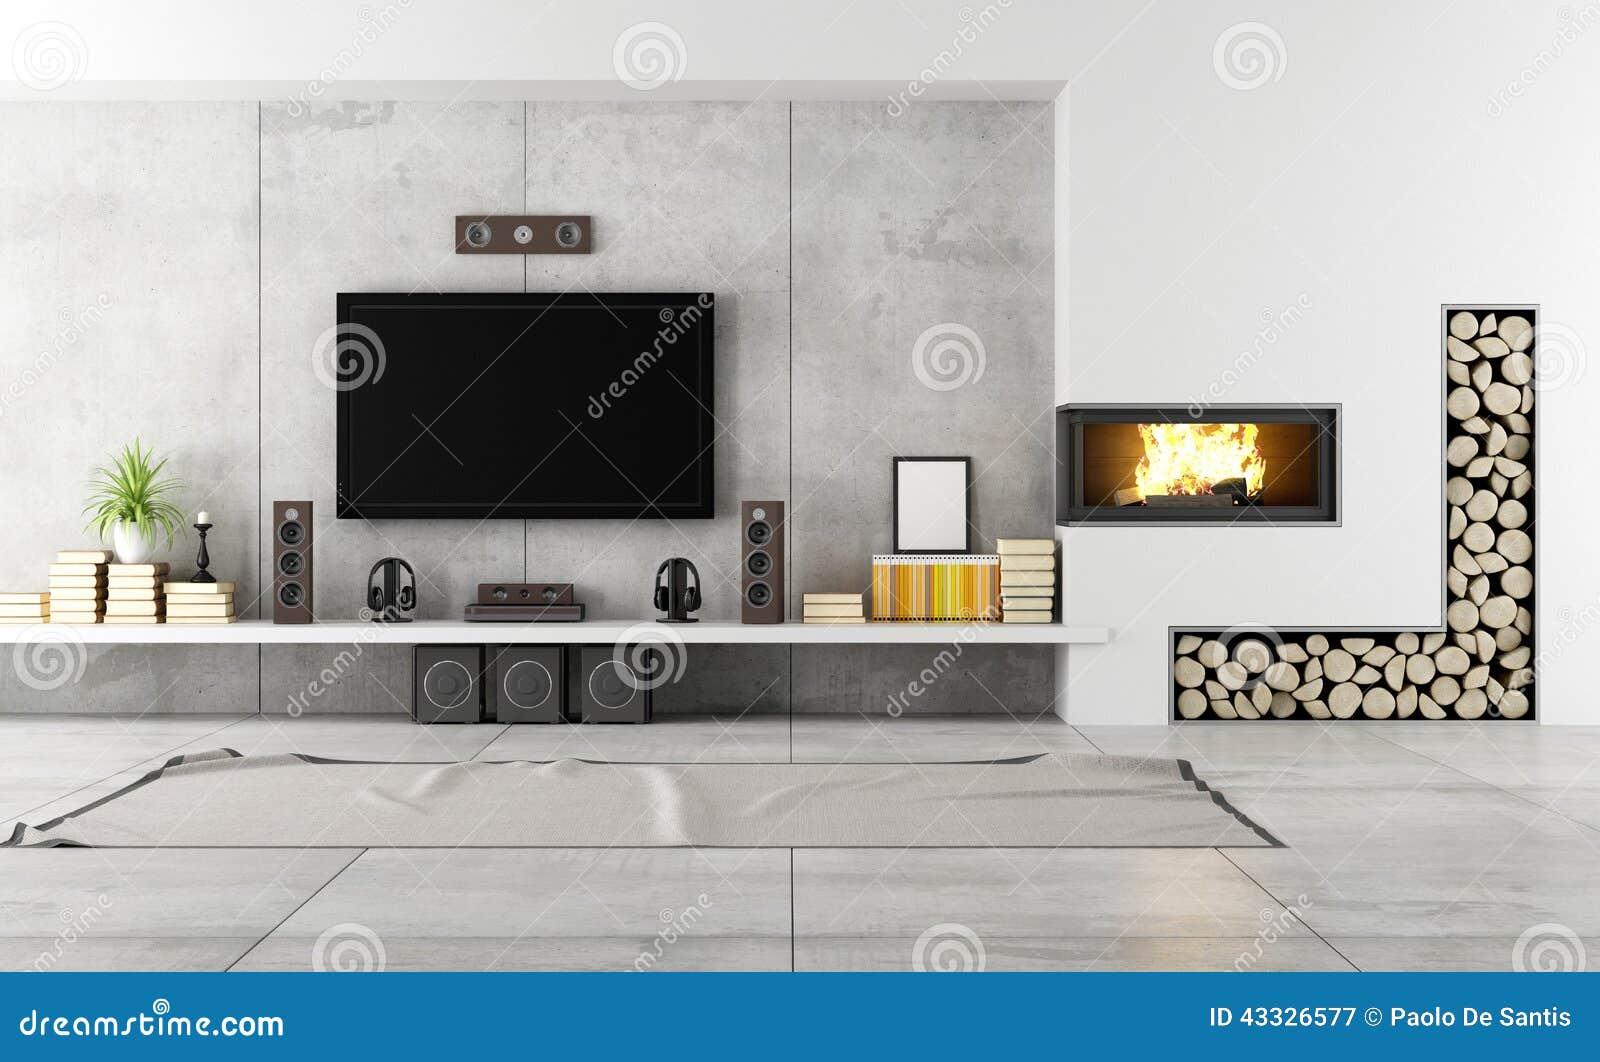 Sal n contempor neo con la chimenea stock de ilustraci n - Salones con chimenea y television ...